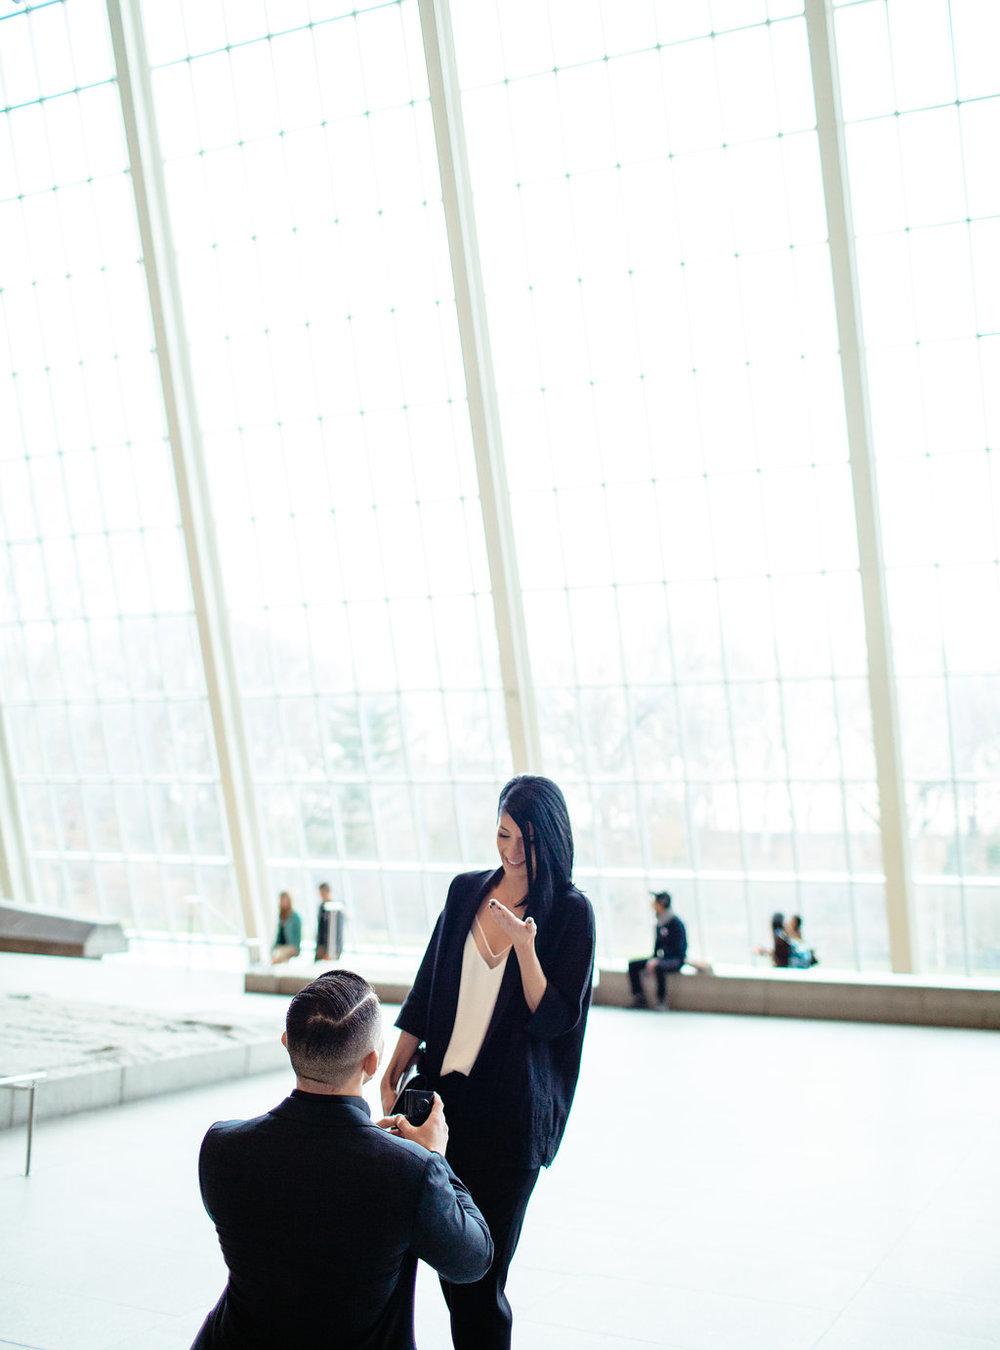 Tomasz and Jessica's surprise wedding proposal at the Metropolitan Museum of Art